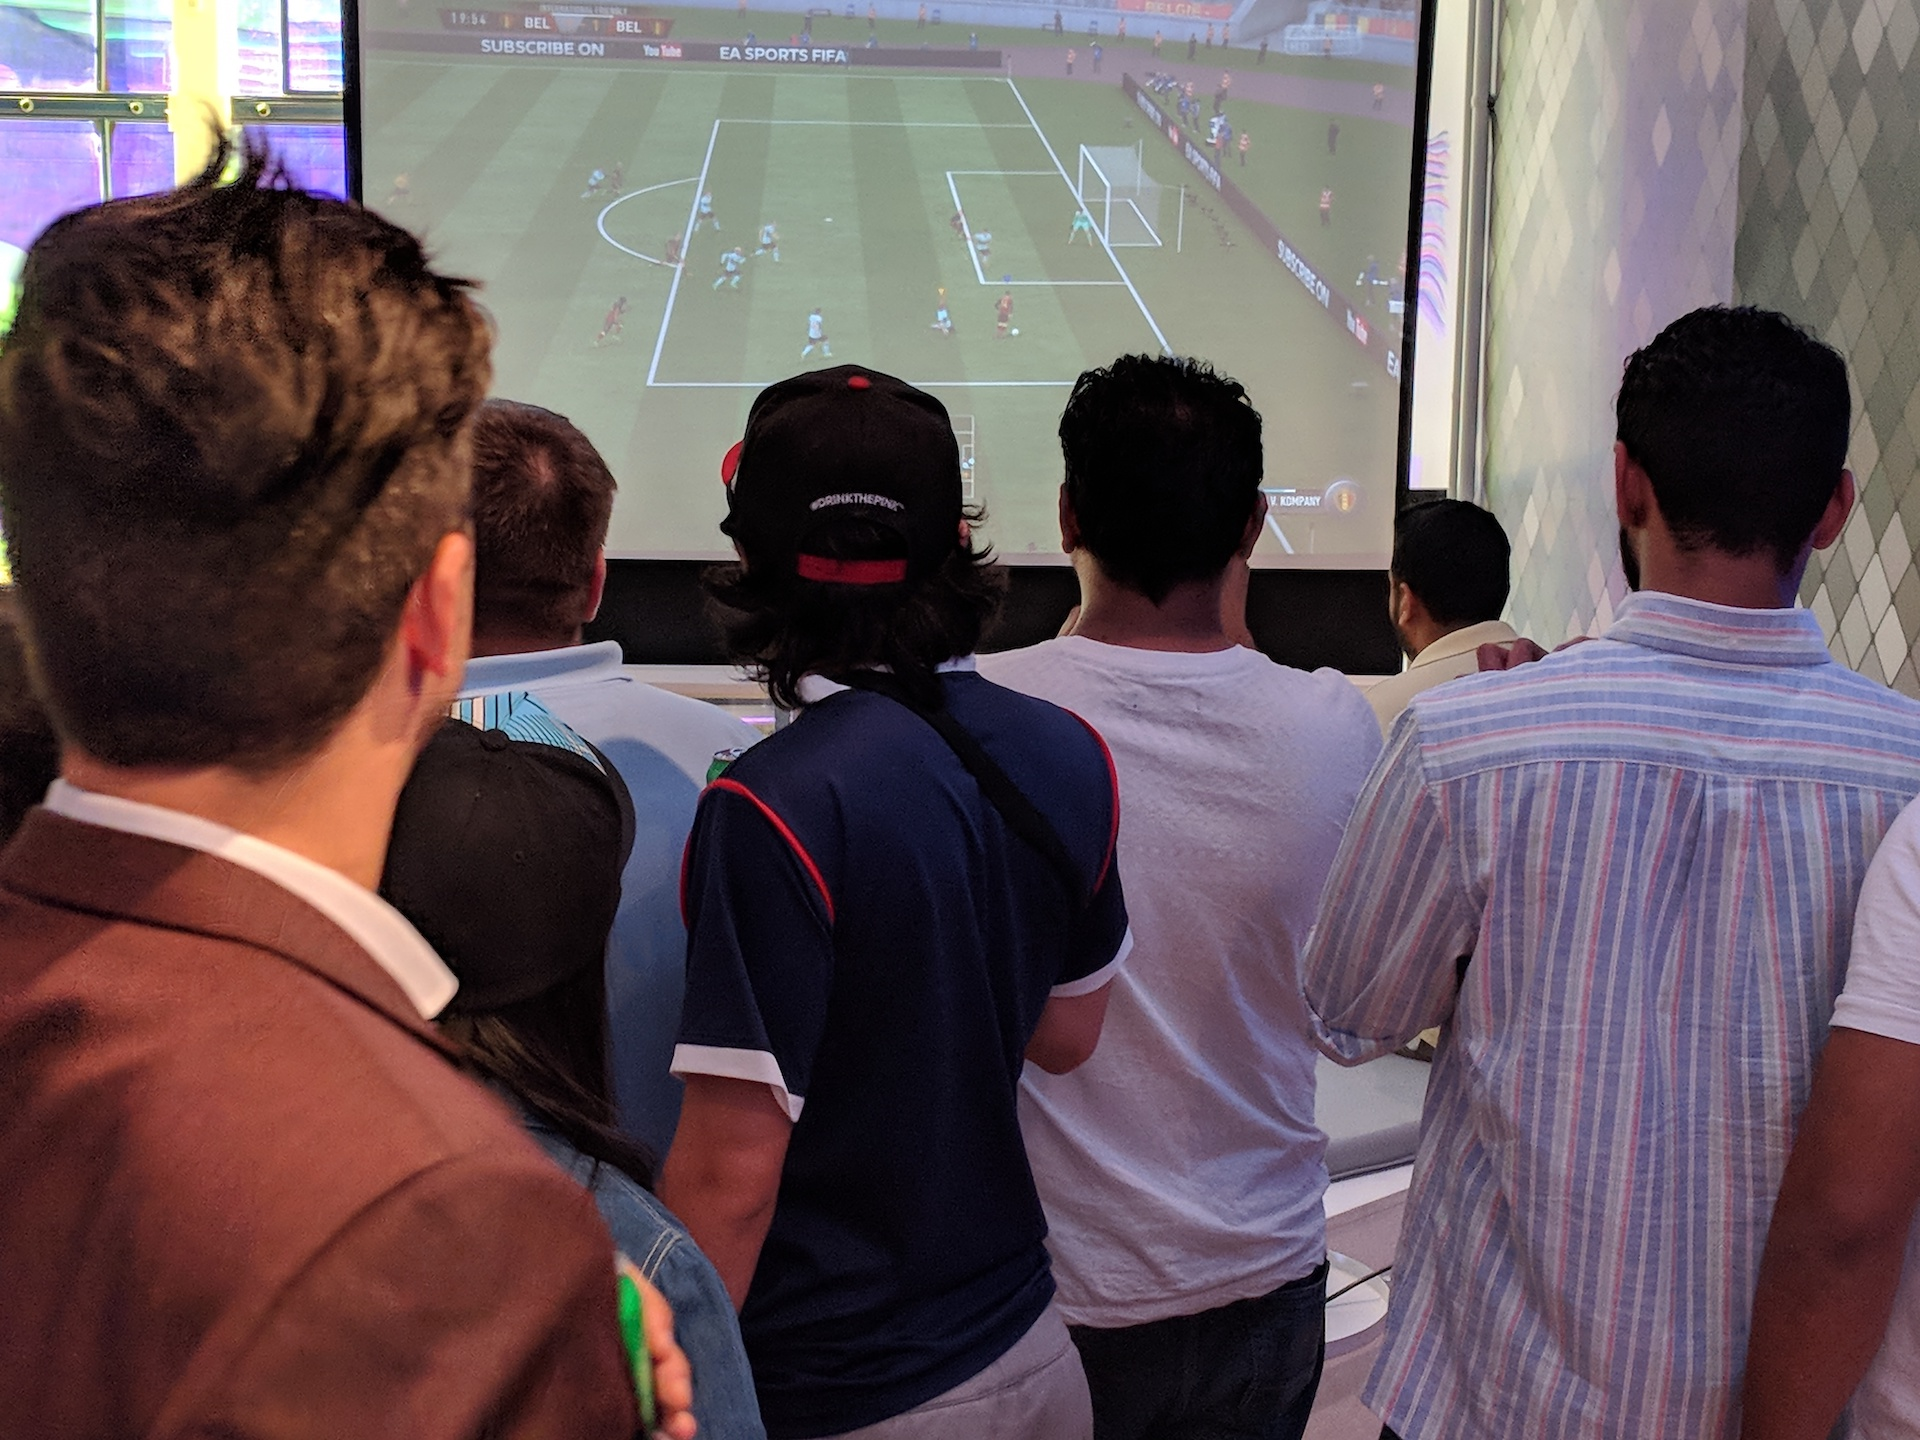 FanBattle Fifa event